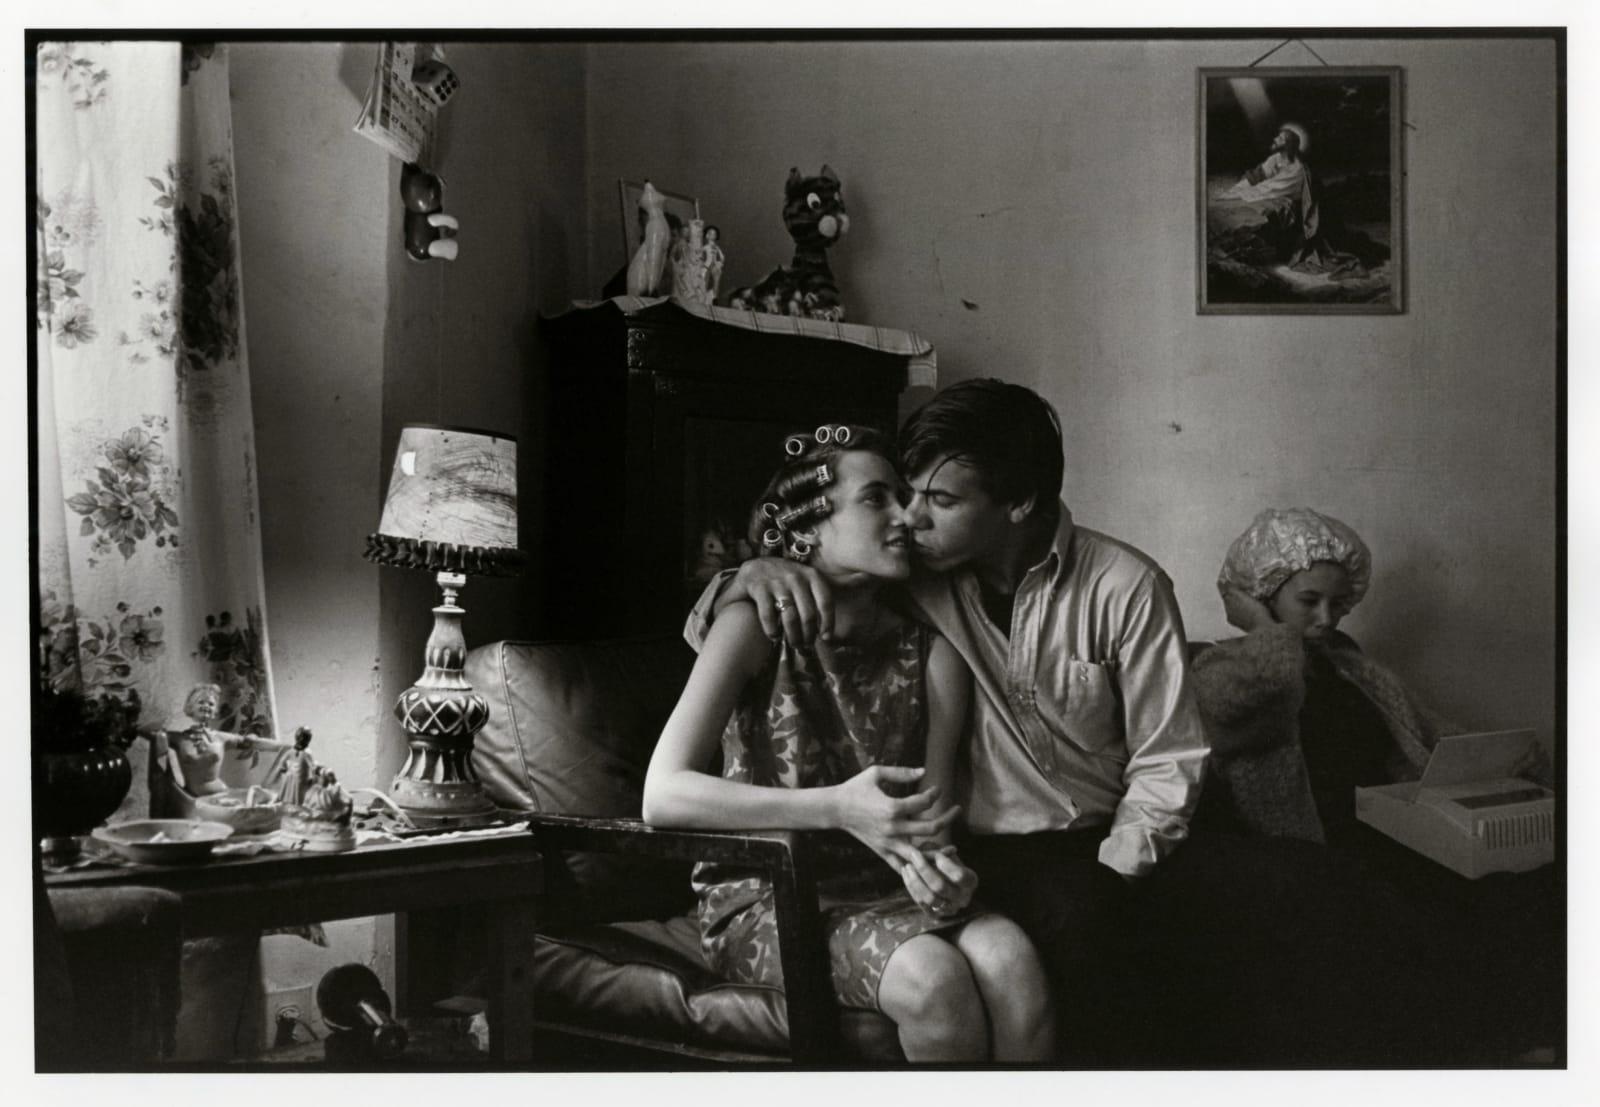 Danny Lyon - Uptown Chicago, 1965